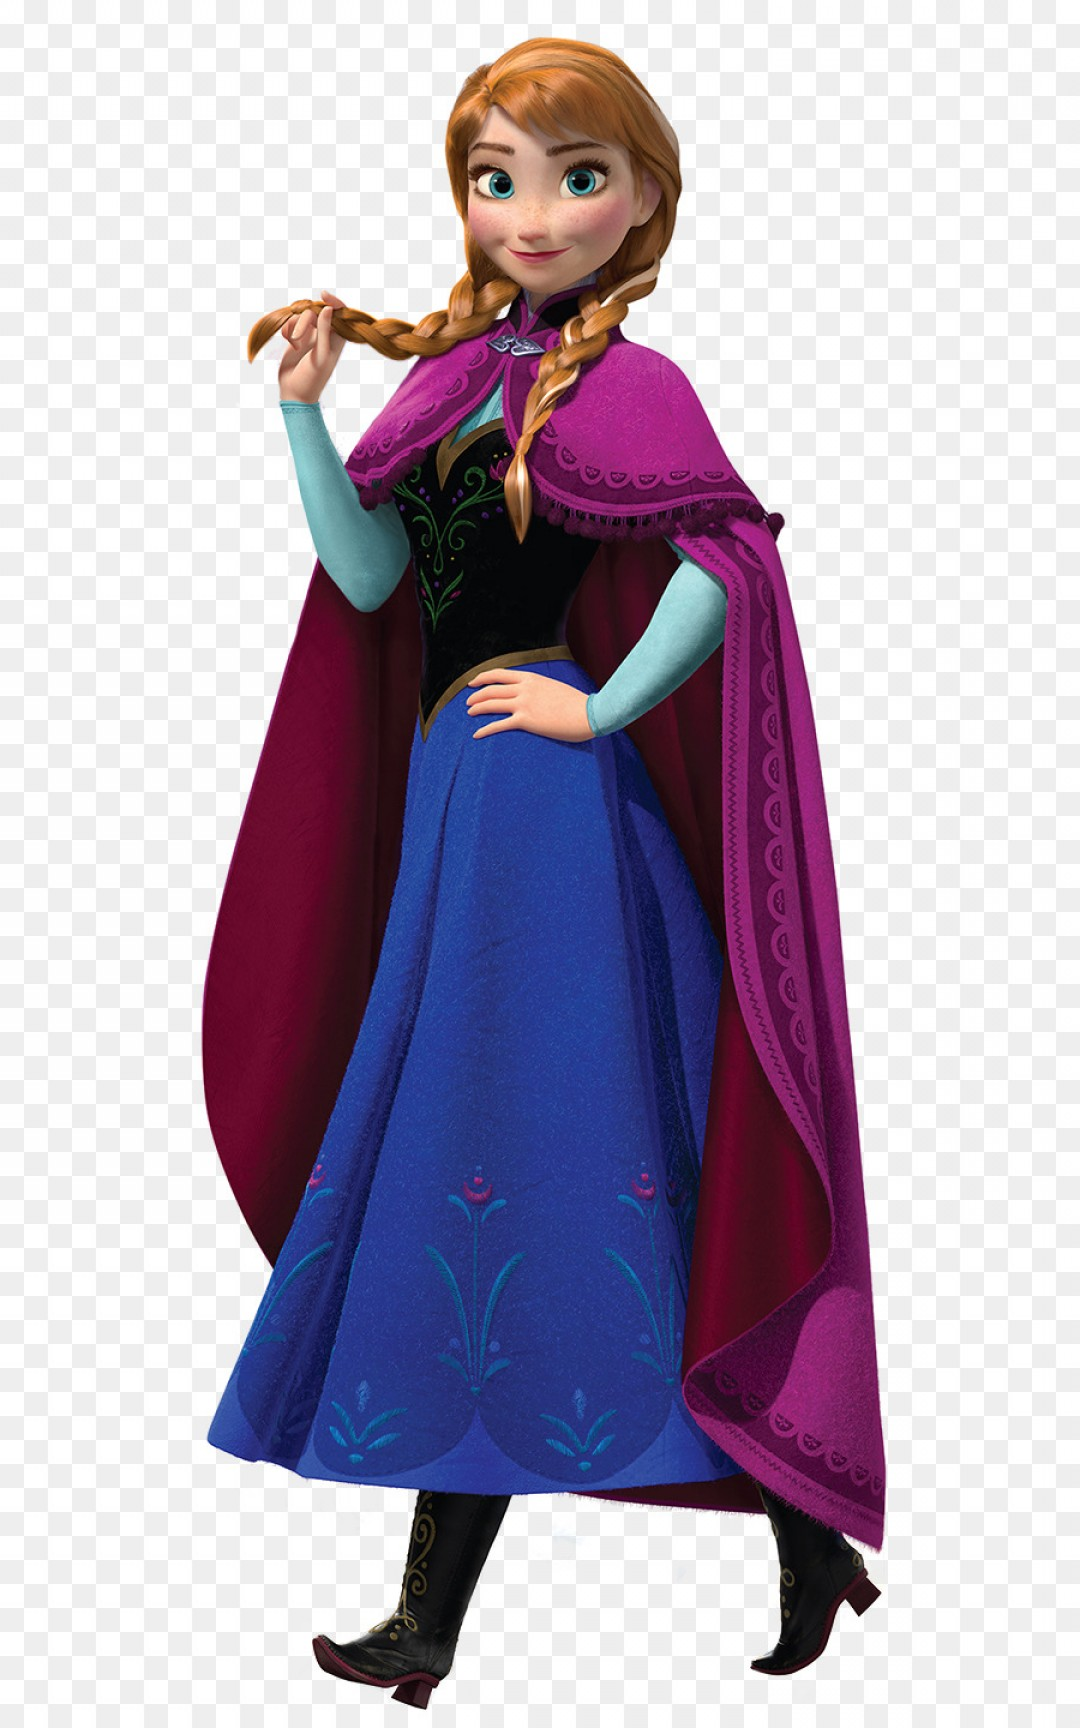 Png Anna Elsa Frozen Olaf Kristoff Lion Dance.